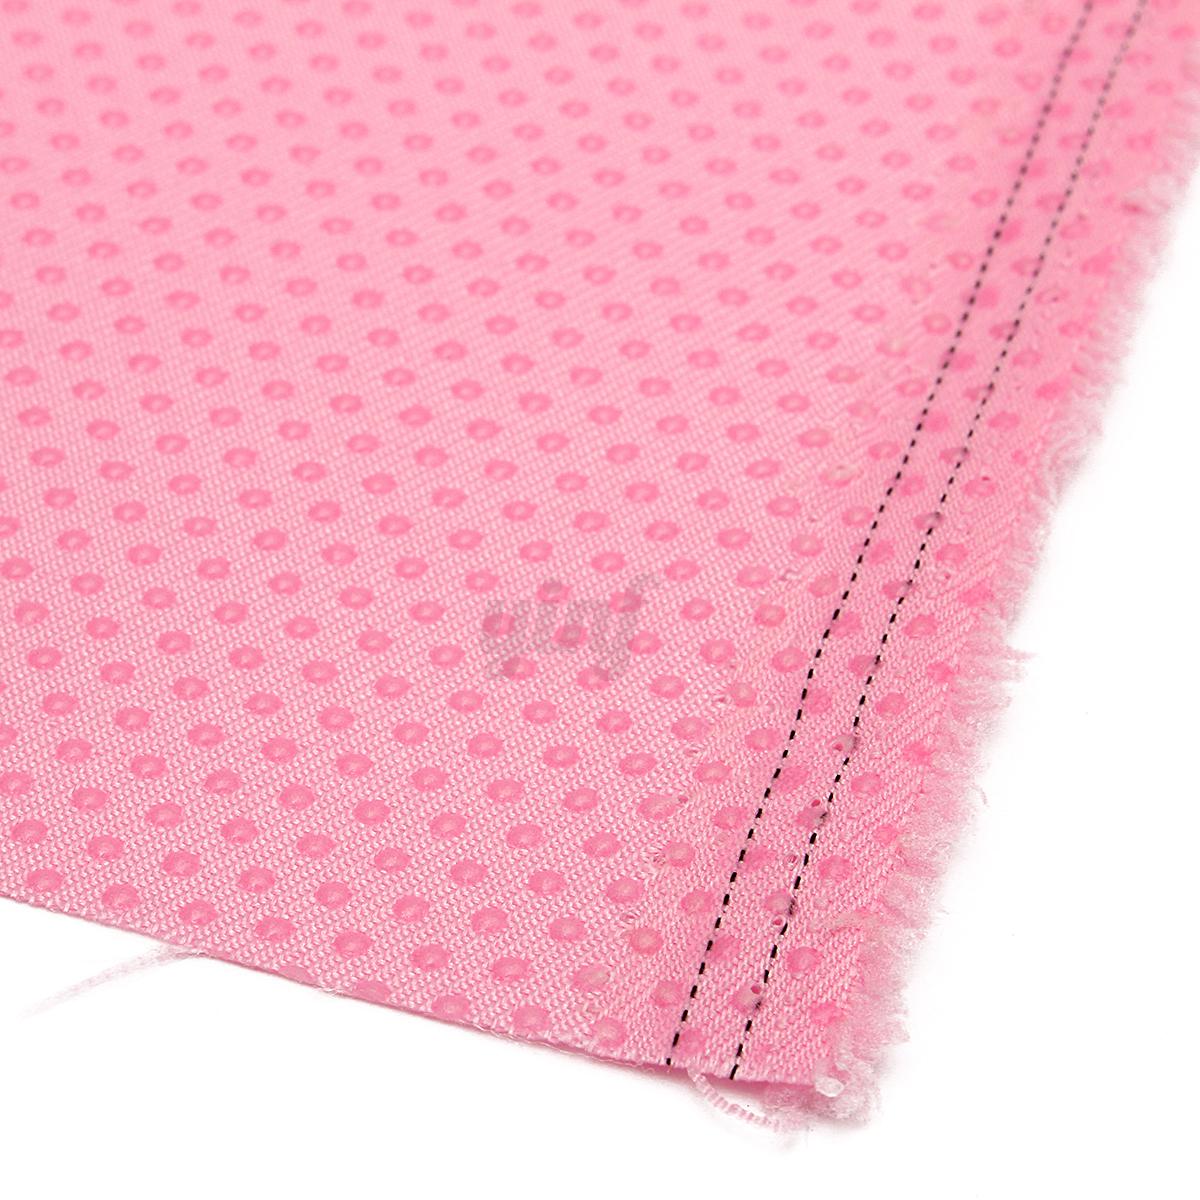 Anti Slip Fabric : Anti slip vinyl fabric non skid dots rubber treated